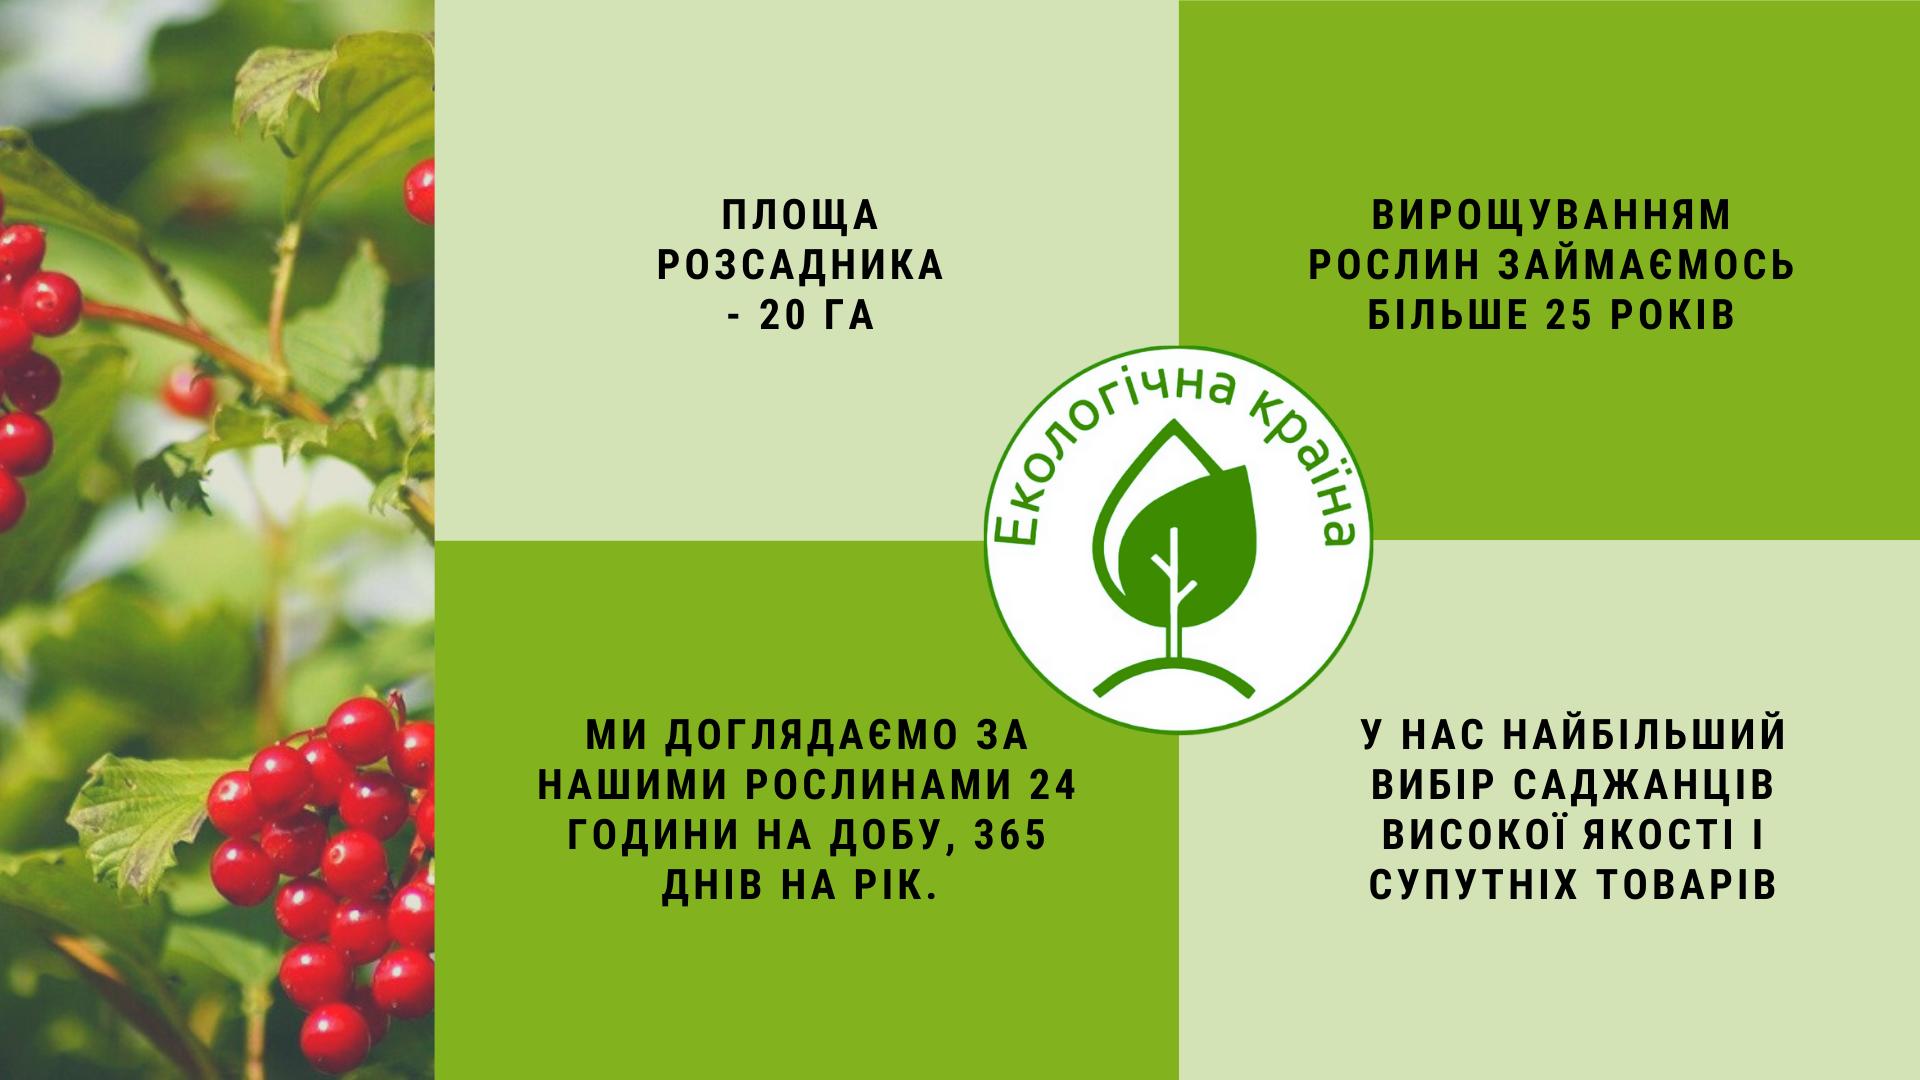 ЕКО-КРАЇНА - розсадник декоративних рослин - про нас